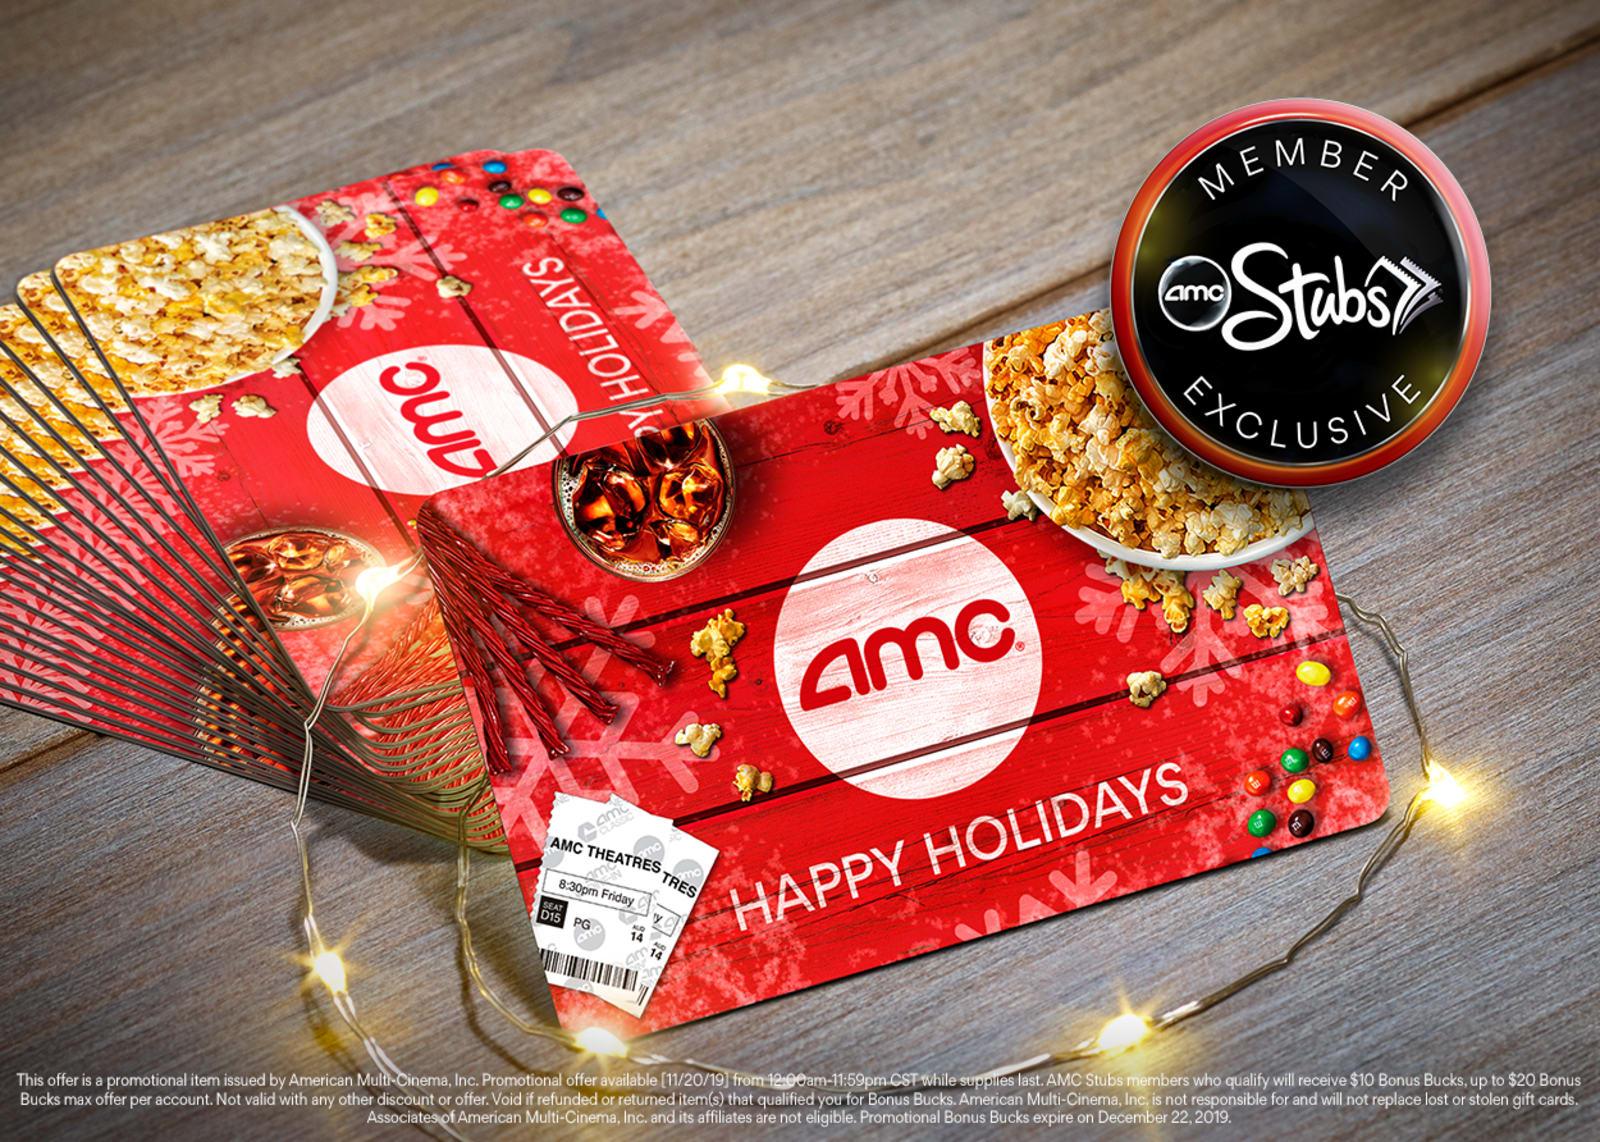 AMC Theatres: Buy $50 AMC eGift Card via app or website, Get $10 in AMC Stubs Bonus Bucks (11/20 Only) *AMC Stubs Member Exclusive Offer